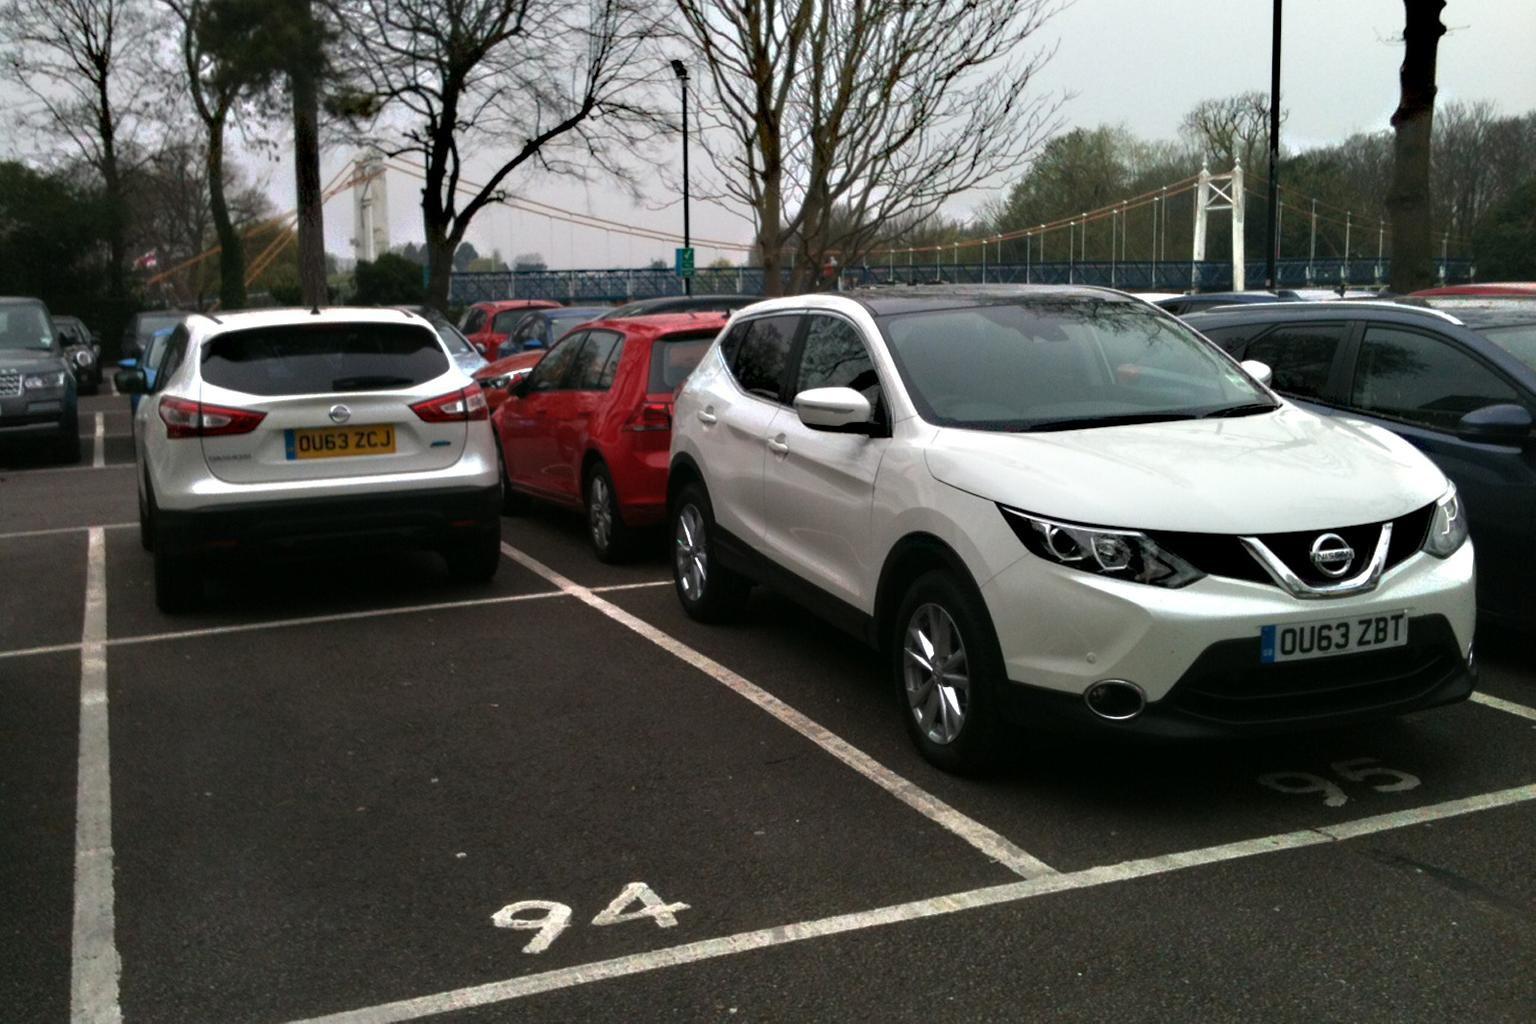 Our cars: Nissan Qashqai, Hyundai i10, Mazda 3 and Kia Carens